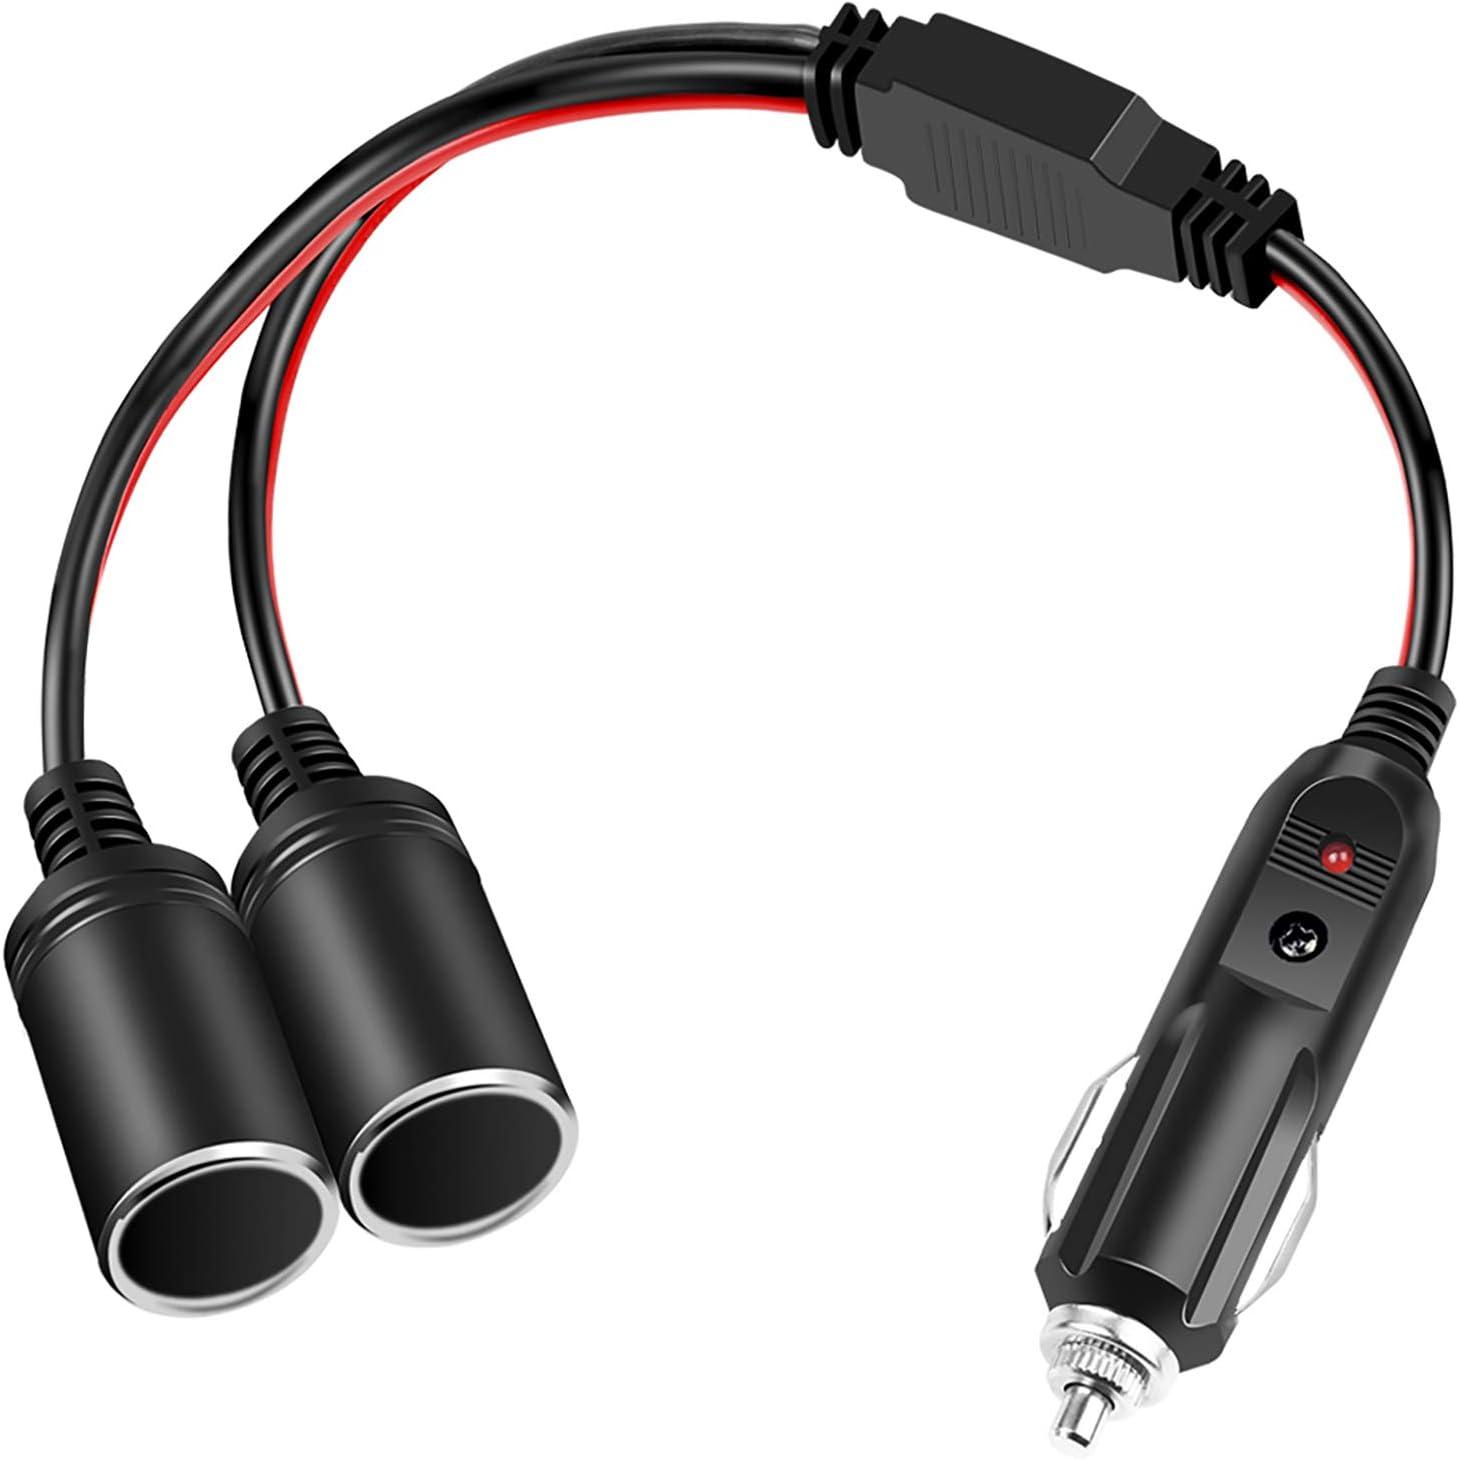 Electop 1-to-2 Cigarette Lighter Splitter Adapter Power Charger Port